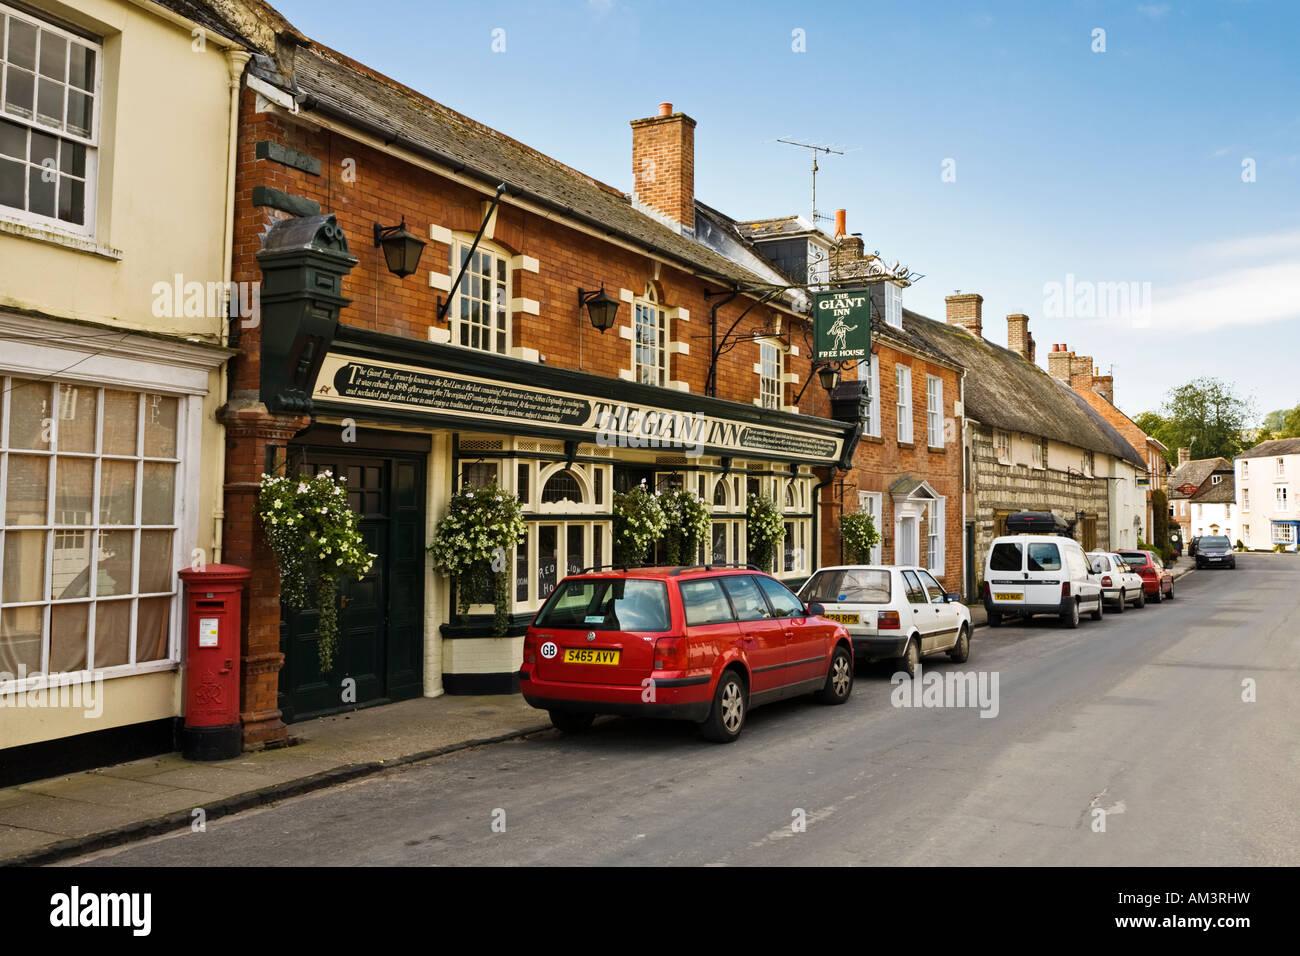 Cerne Abbas village, Dorset, UK - with the Giant Inn pub - Stock Image